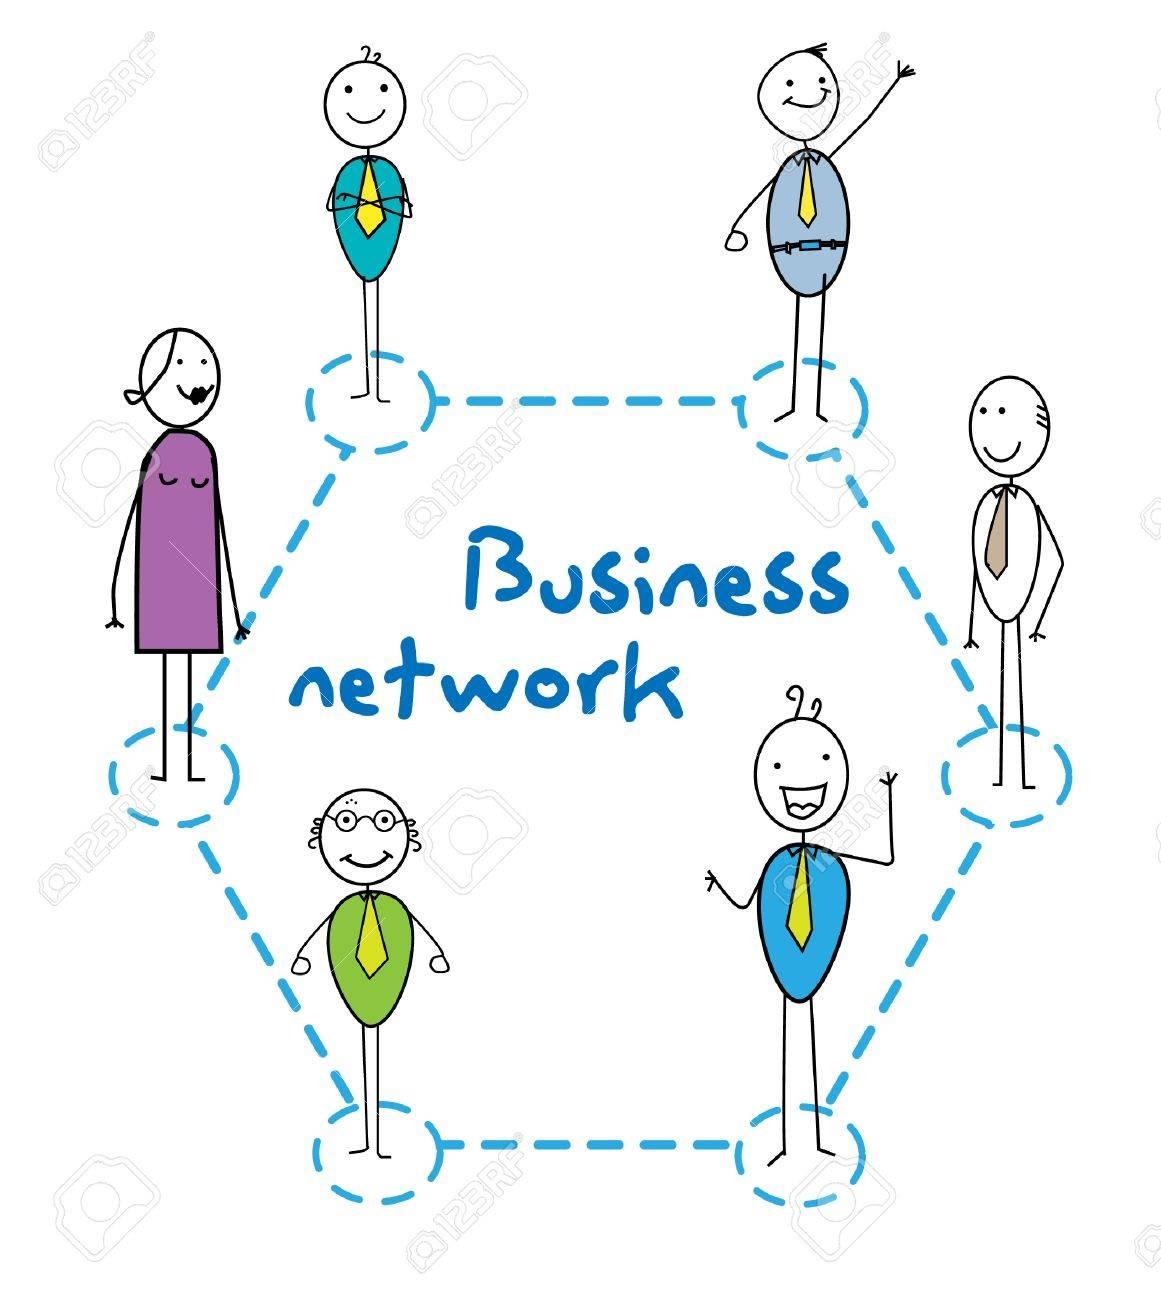 business network Stock Vector - 11079413